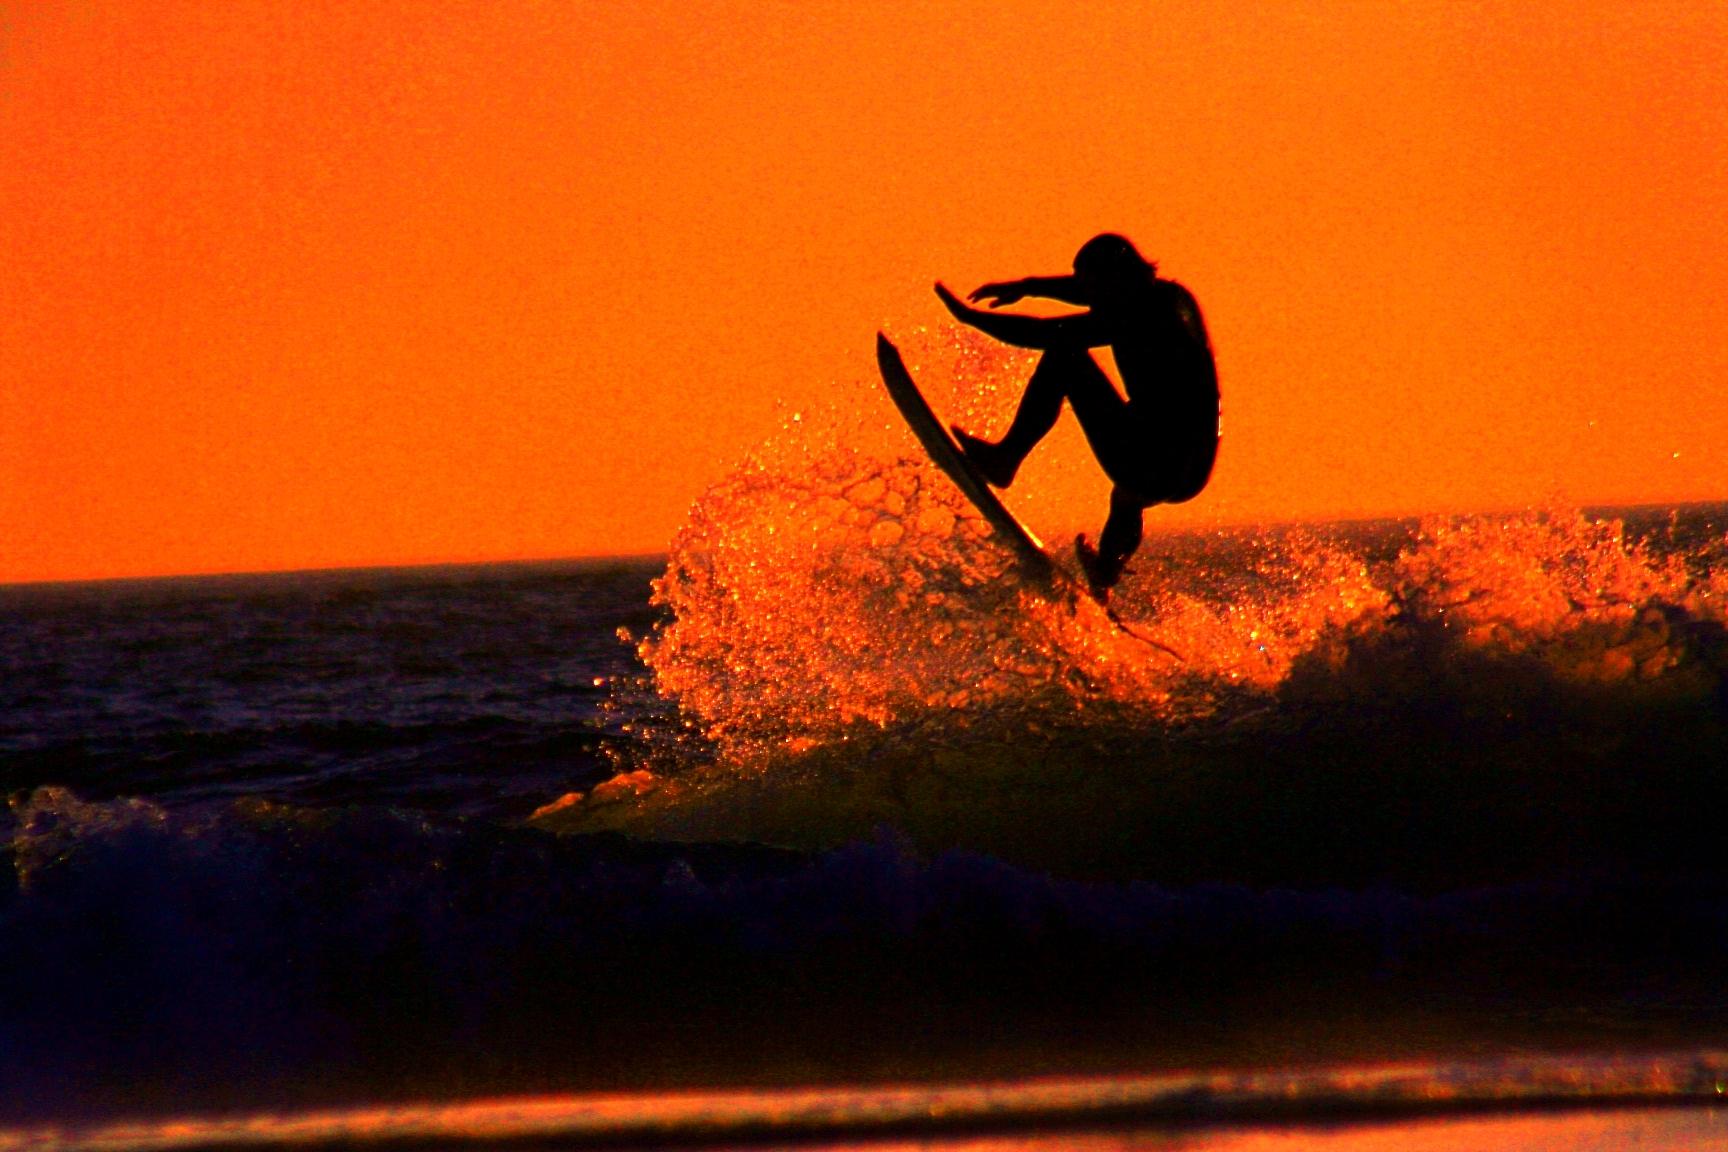 Filesunset Surferjpg